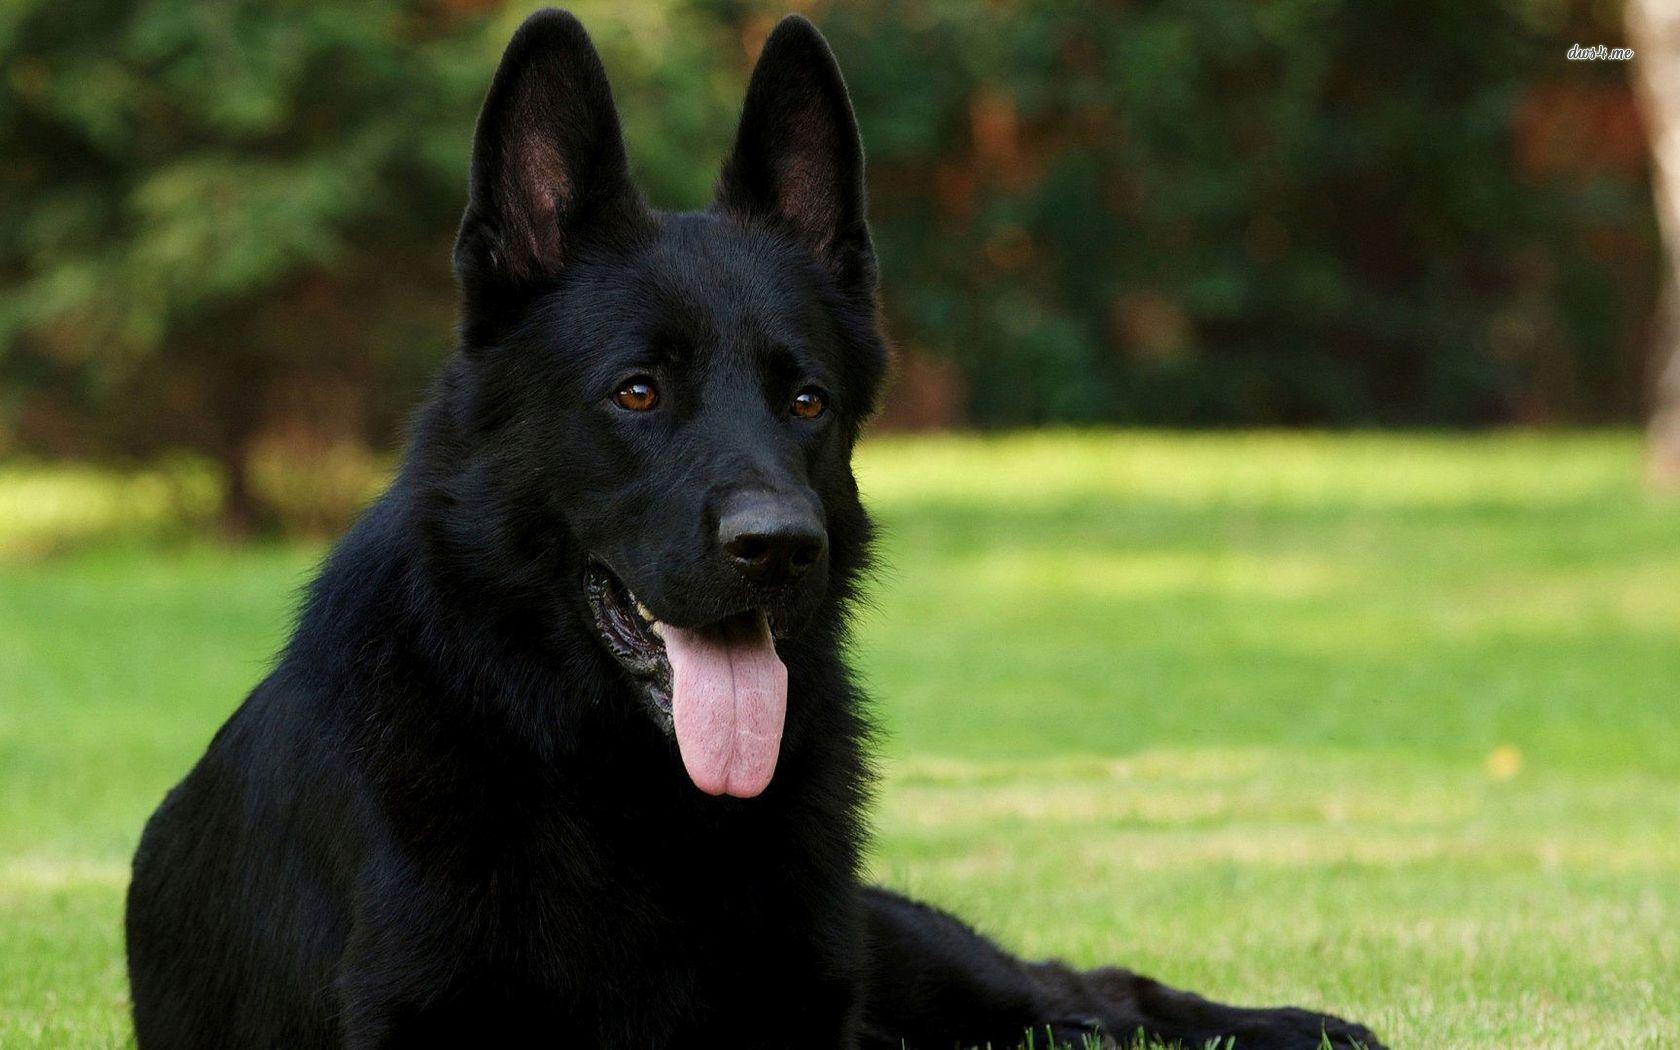 Fantastic Wallpaper Black Adorable Dog - Adorable-Black-German-Shepherd-Dog-Picture1  Photograph_48177  .jpg